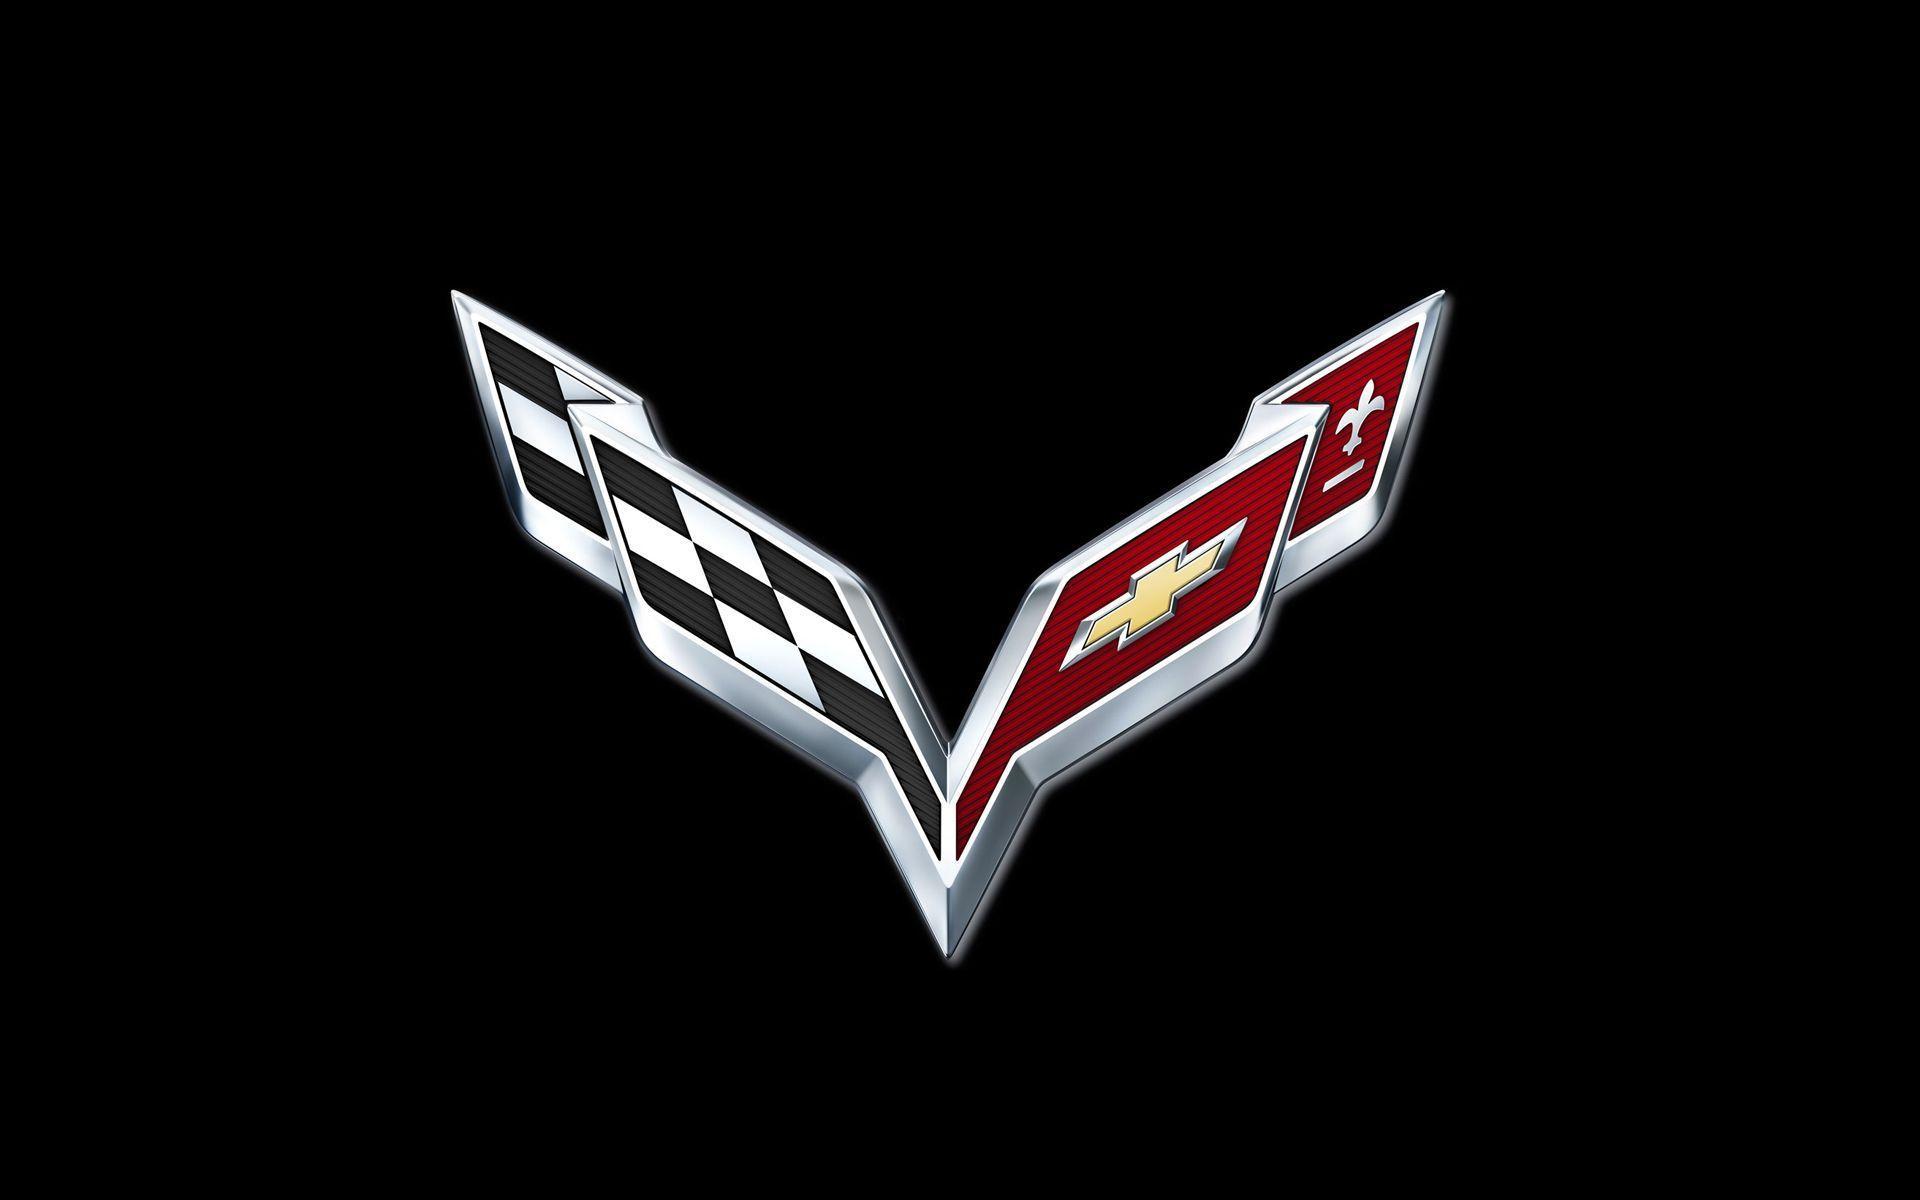 Corvette Logo Wallpapers Top Free Corvette Logo